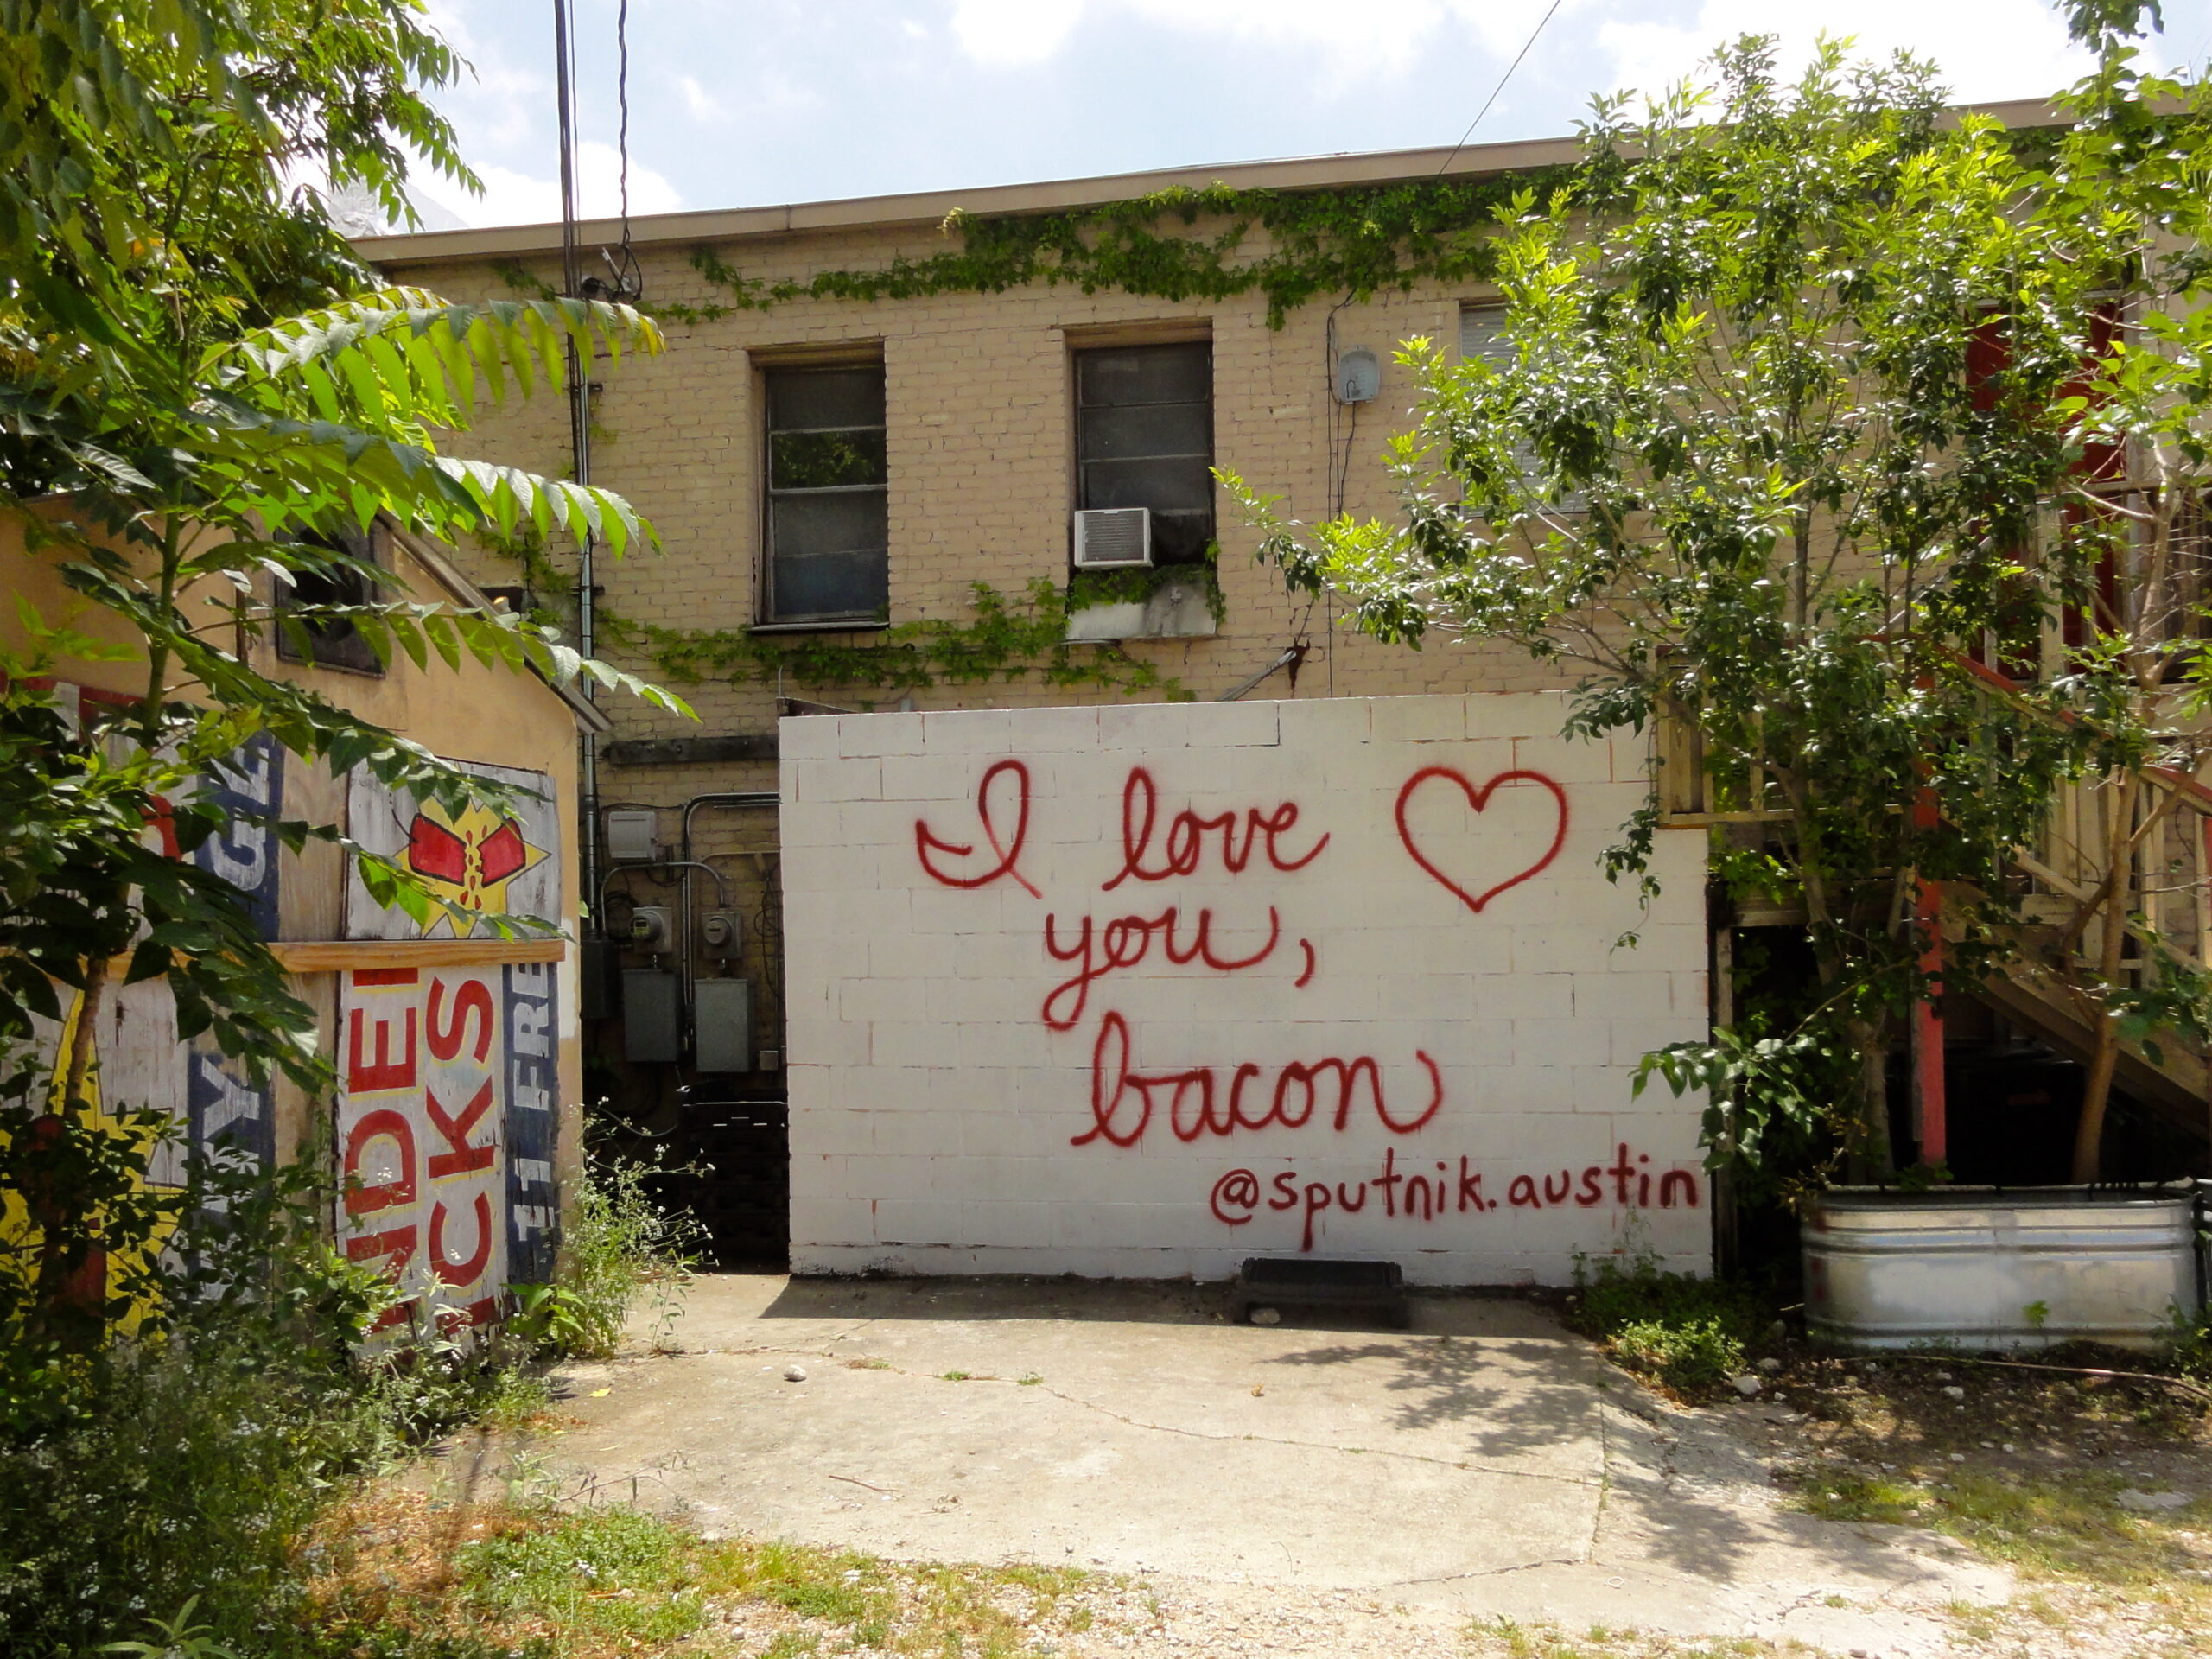 I Love You, Bacon Mural